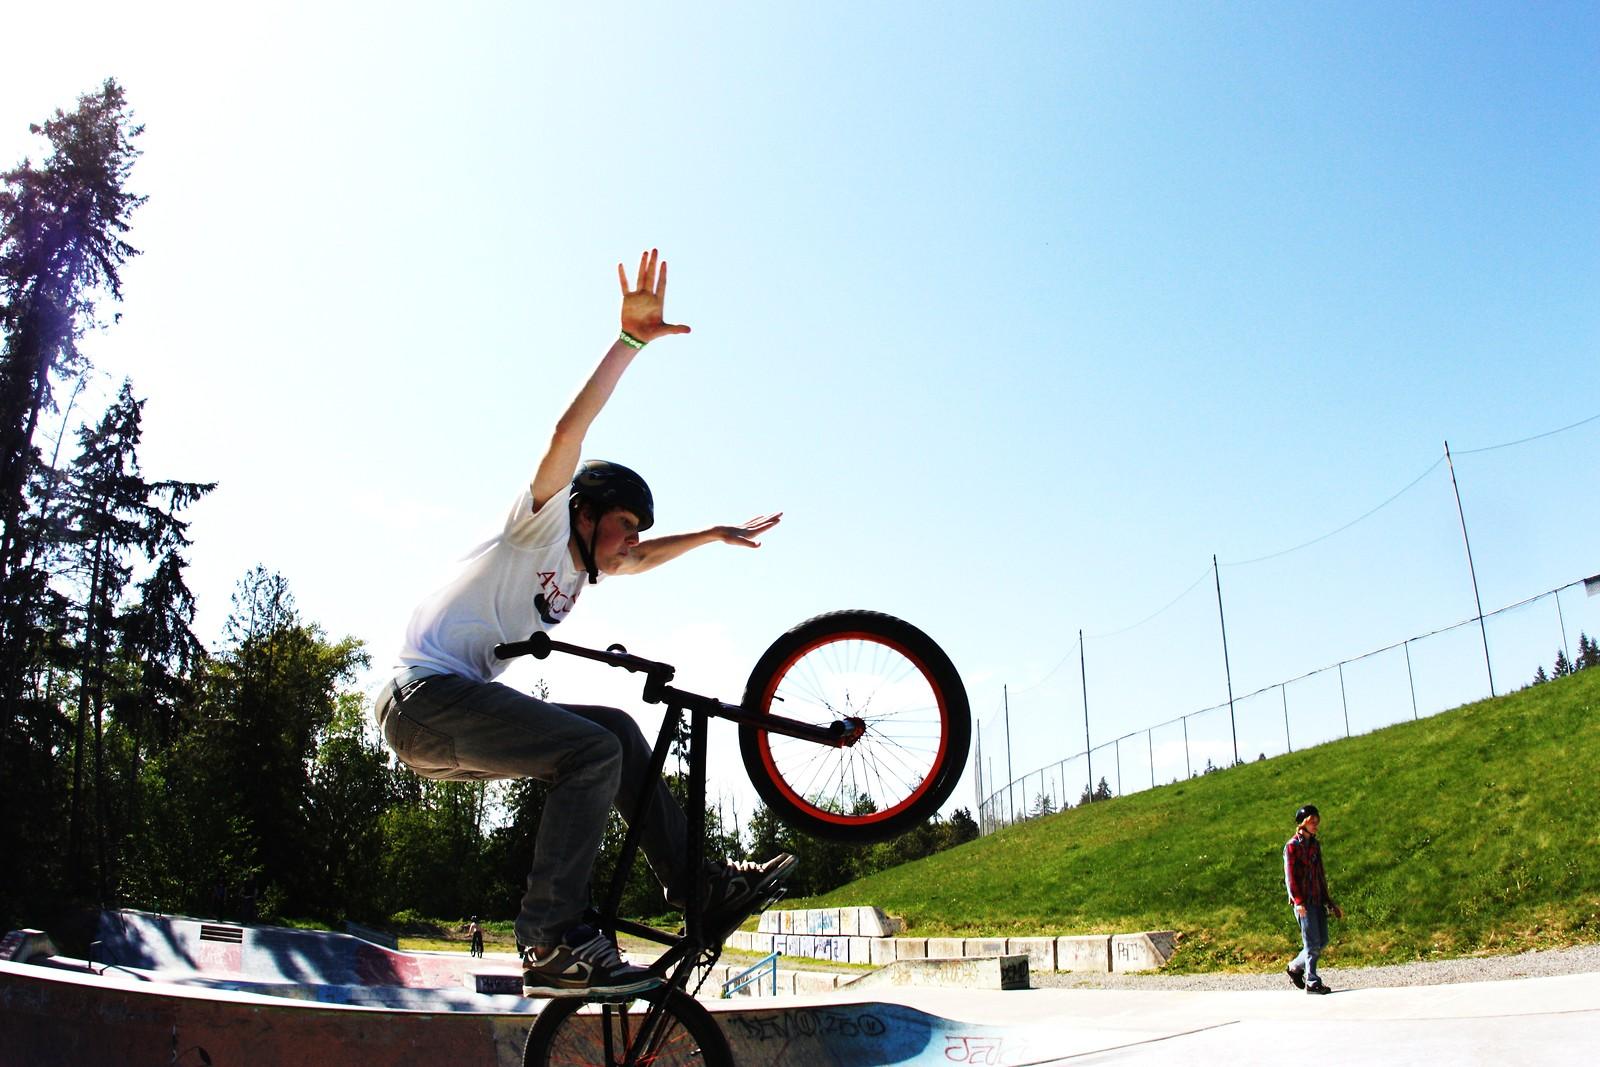 tuck no - Super T - Mountain Biking Pictures - Vital MTB